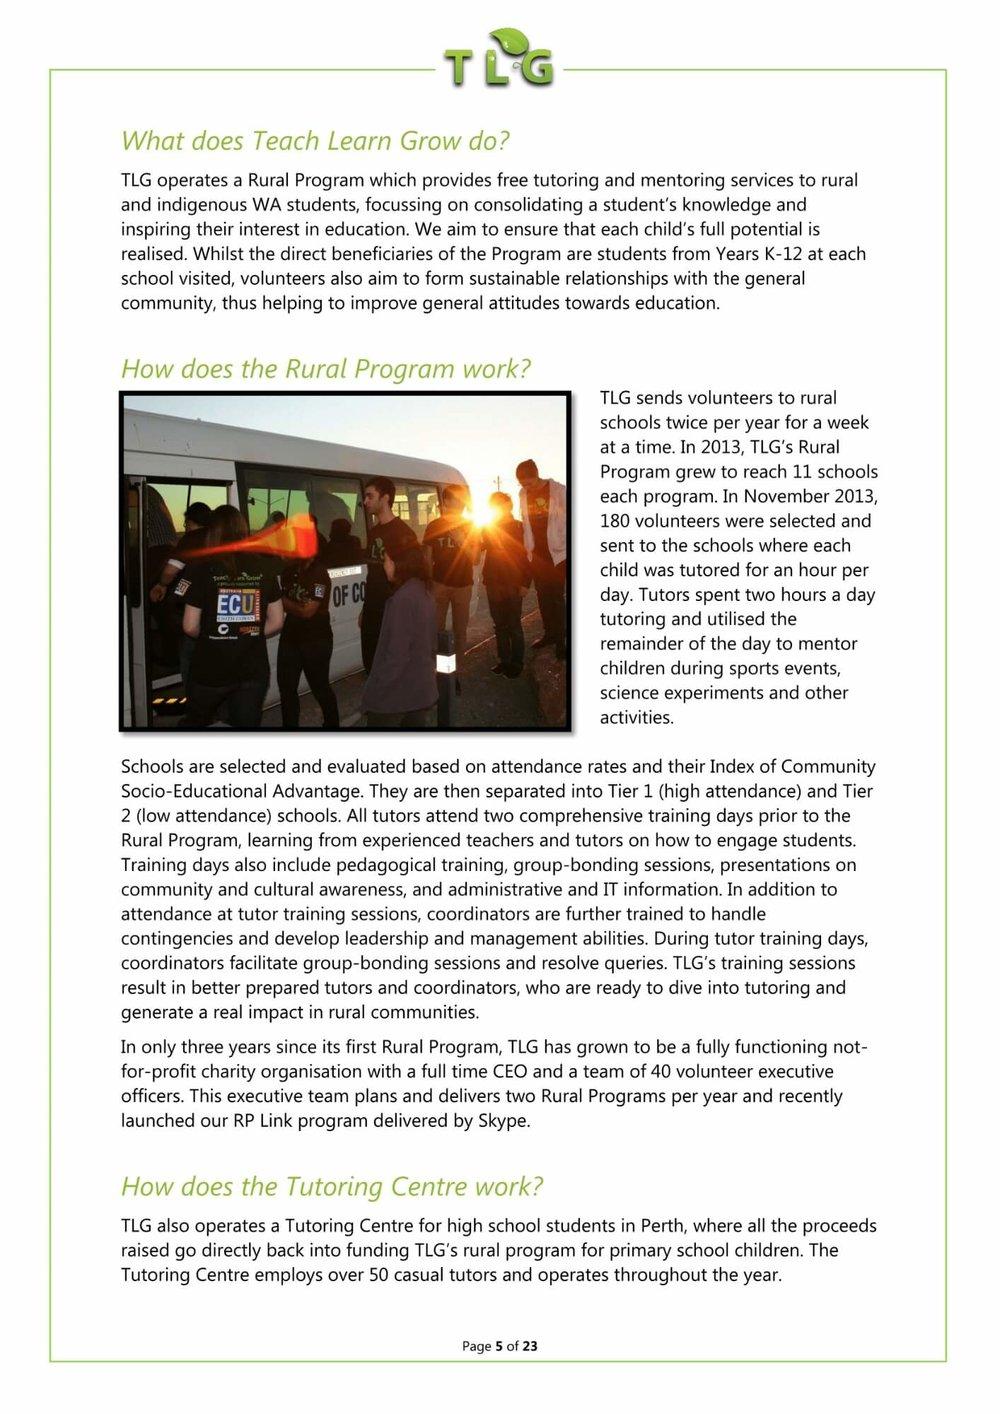 tlg-annual-report-FY13-05.jpg